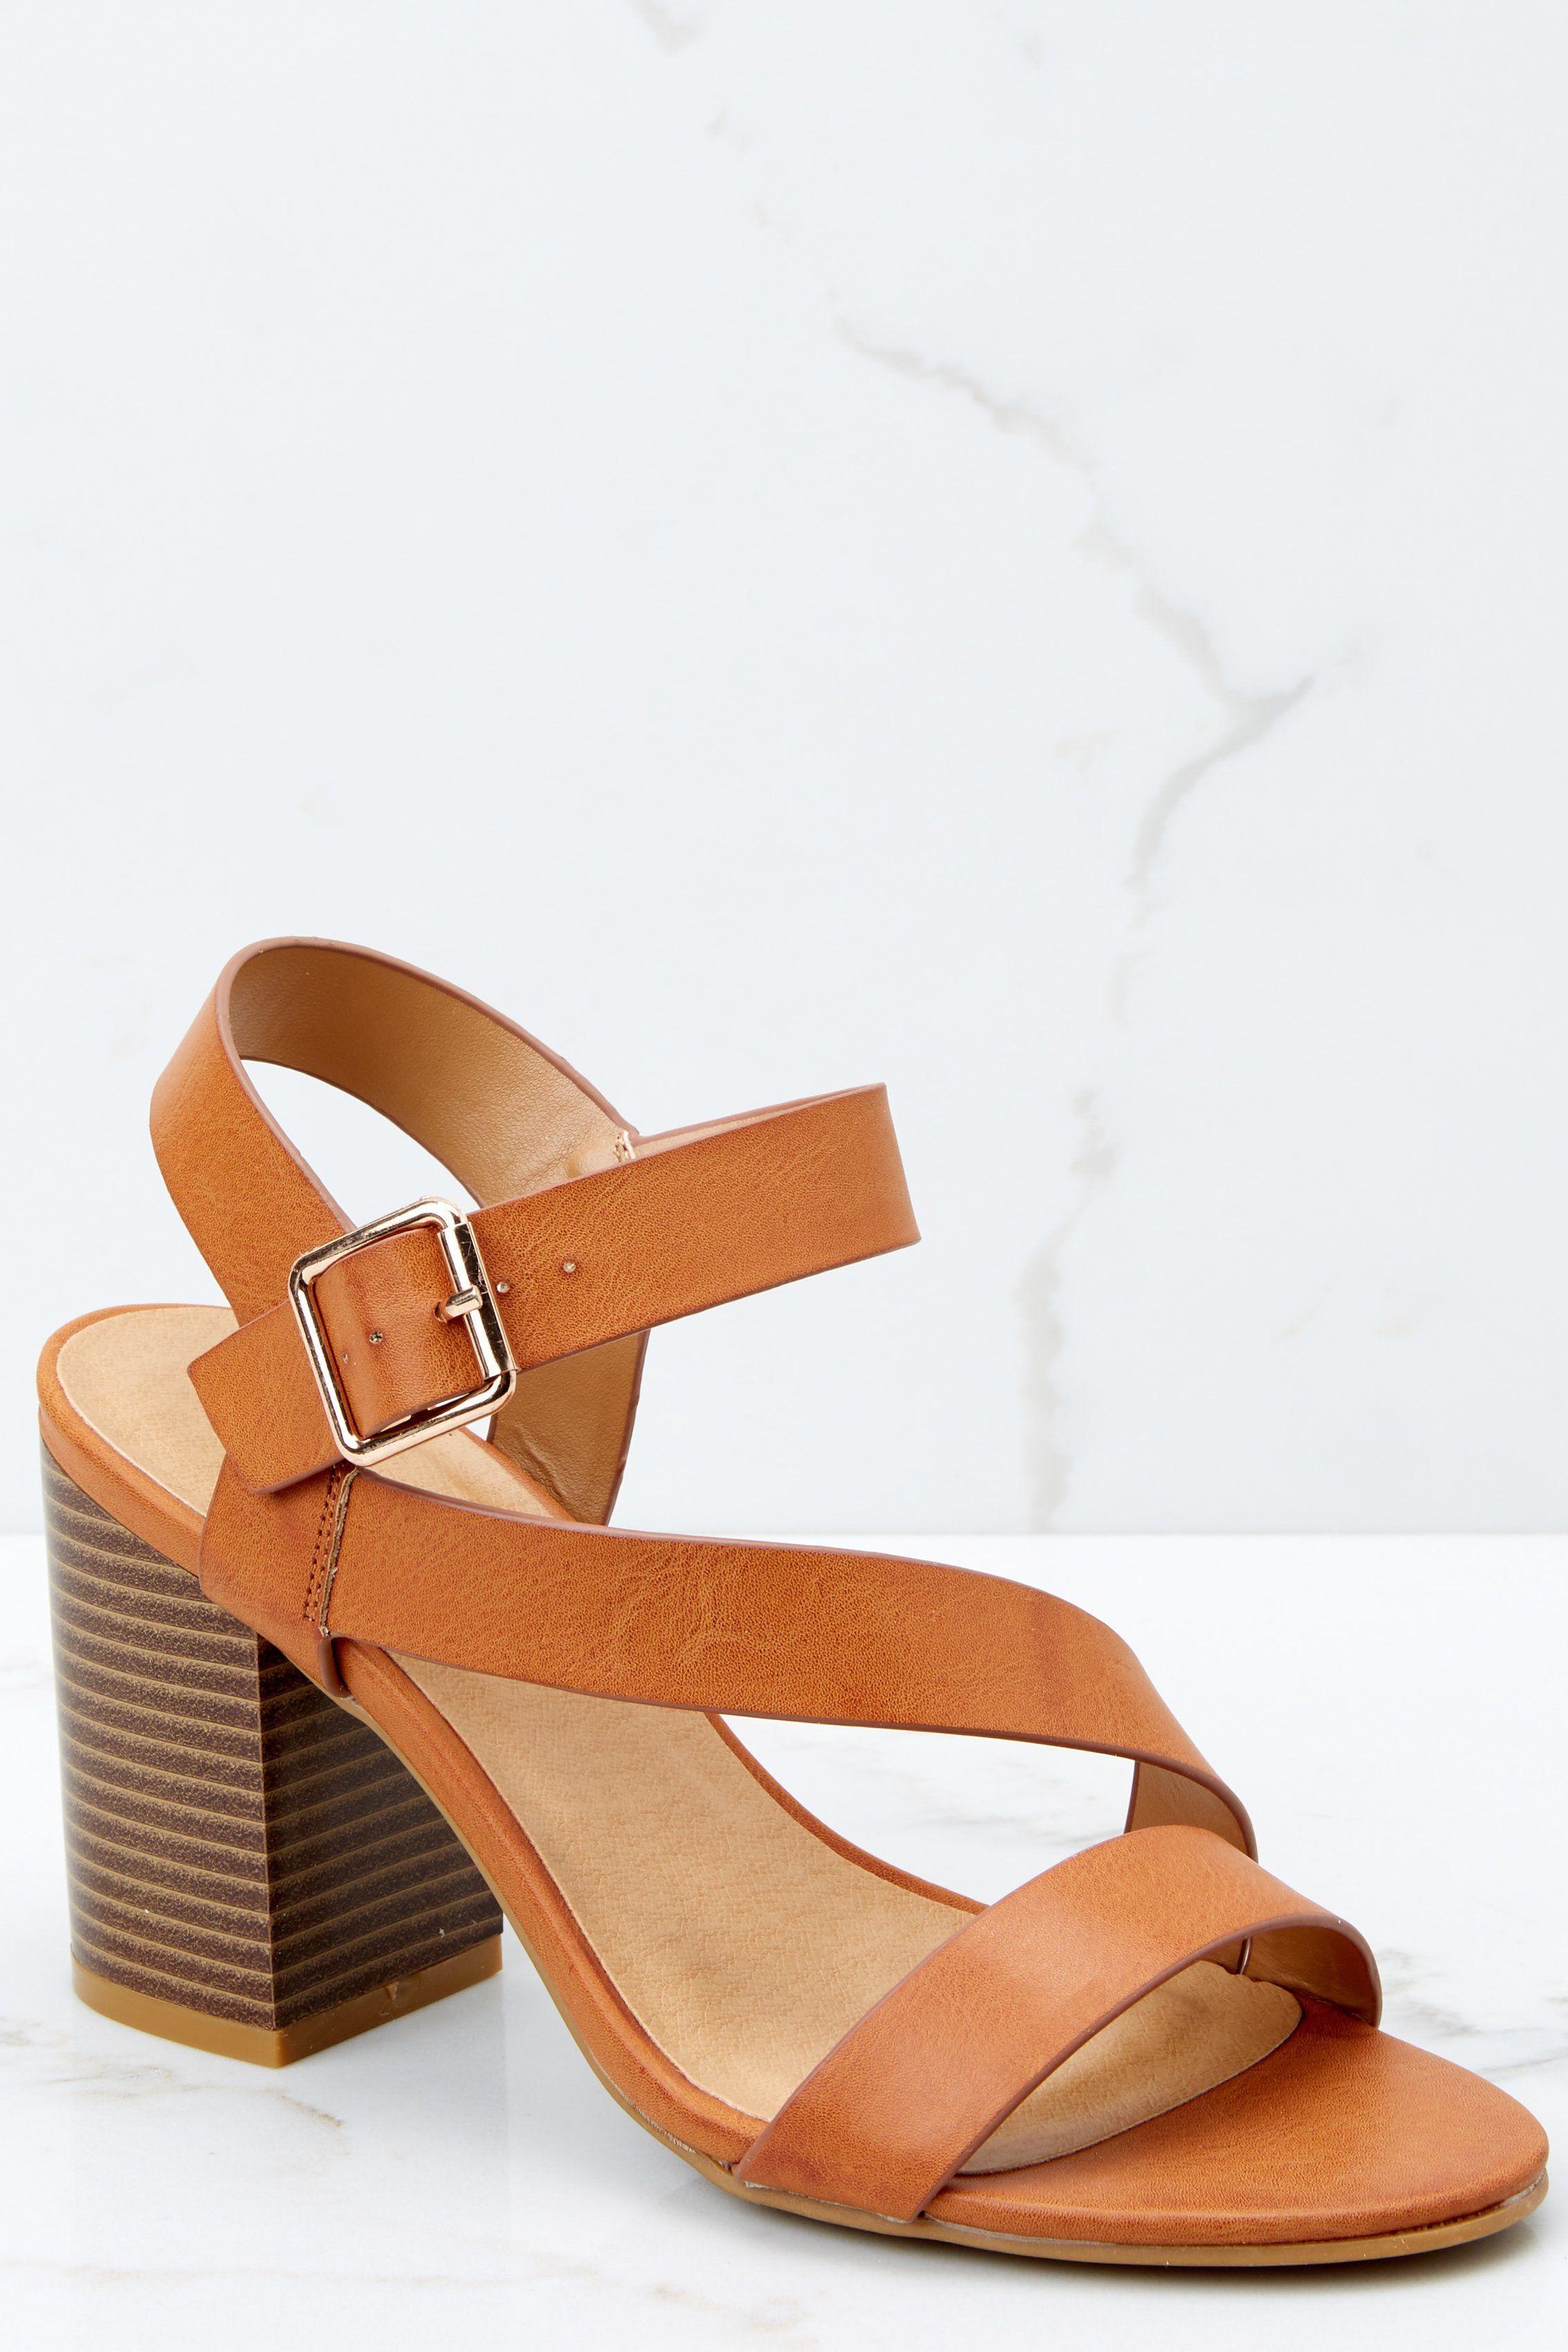 519a1aed9d54c0 Flirty Tan Heels - Tan Heels - Heels -  34 – Red Dress Boutique   SandalsHeels